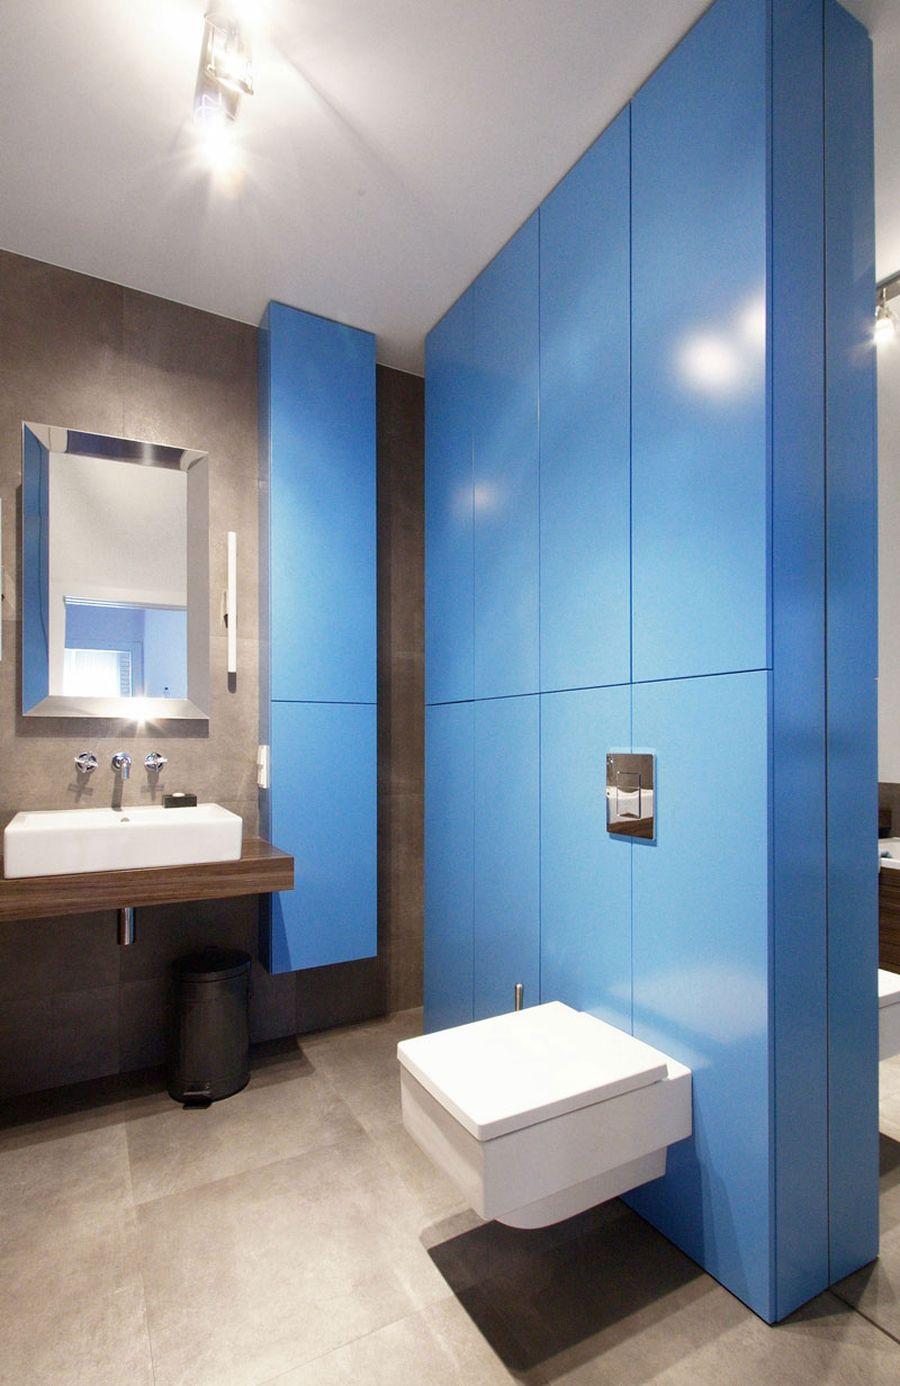 Small space saving bathroom idea